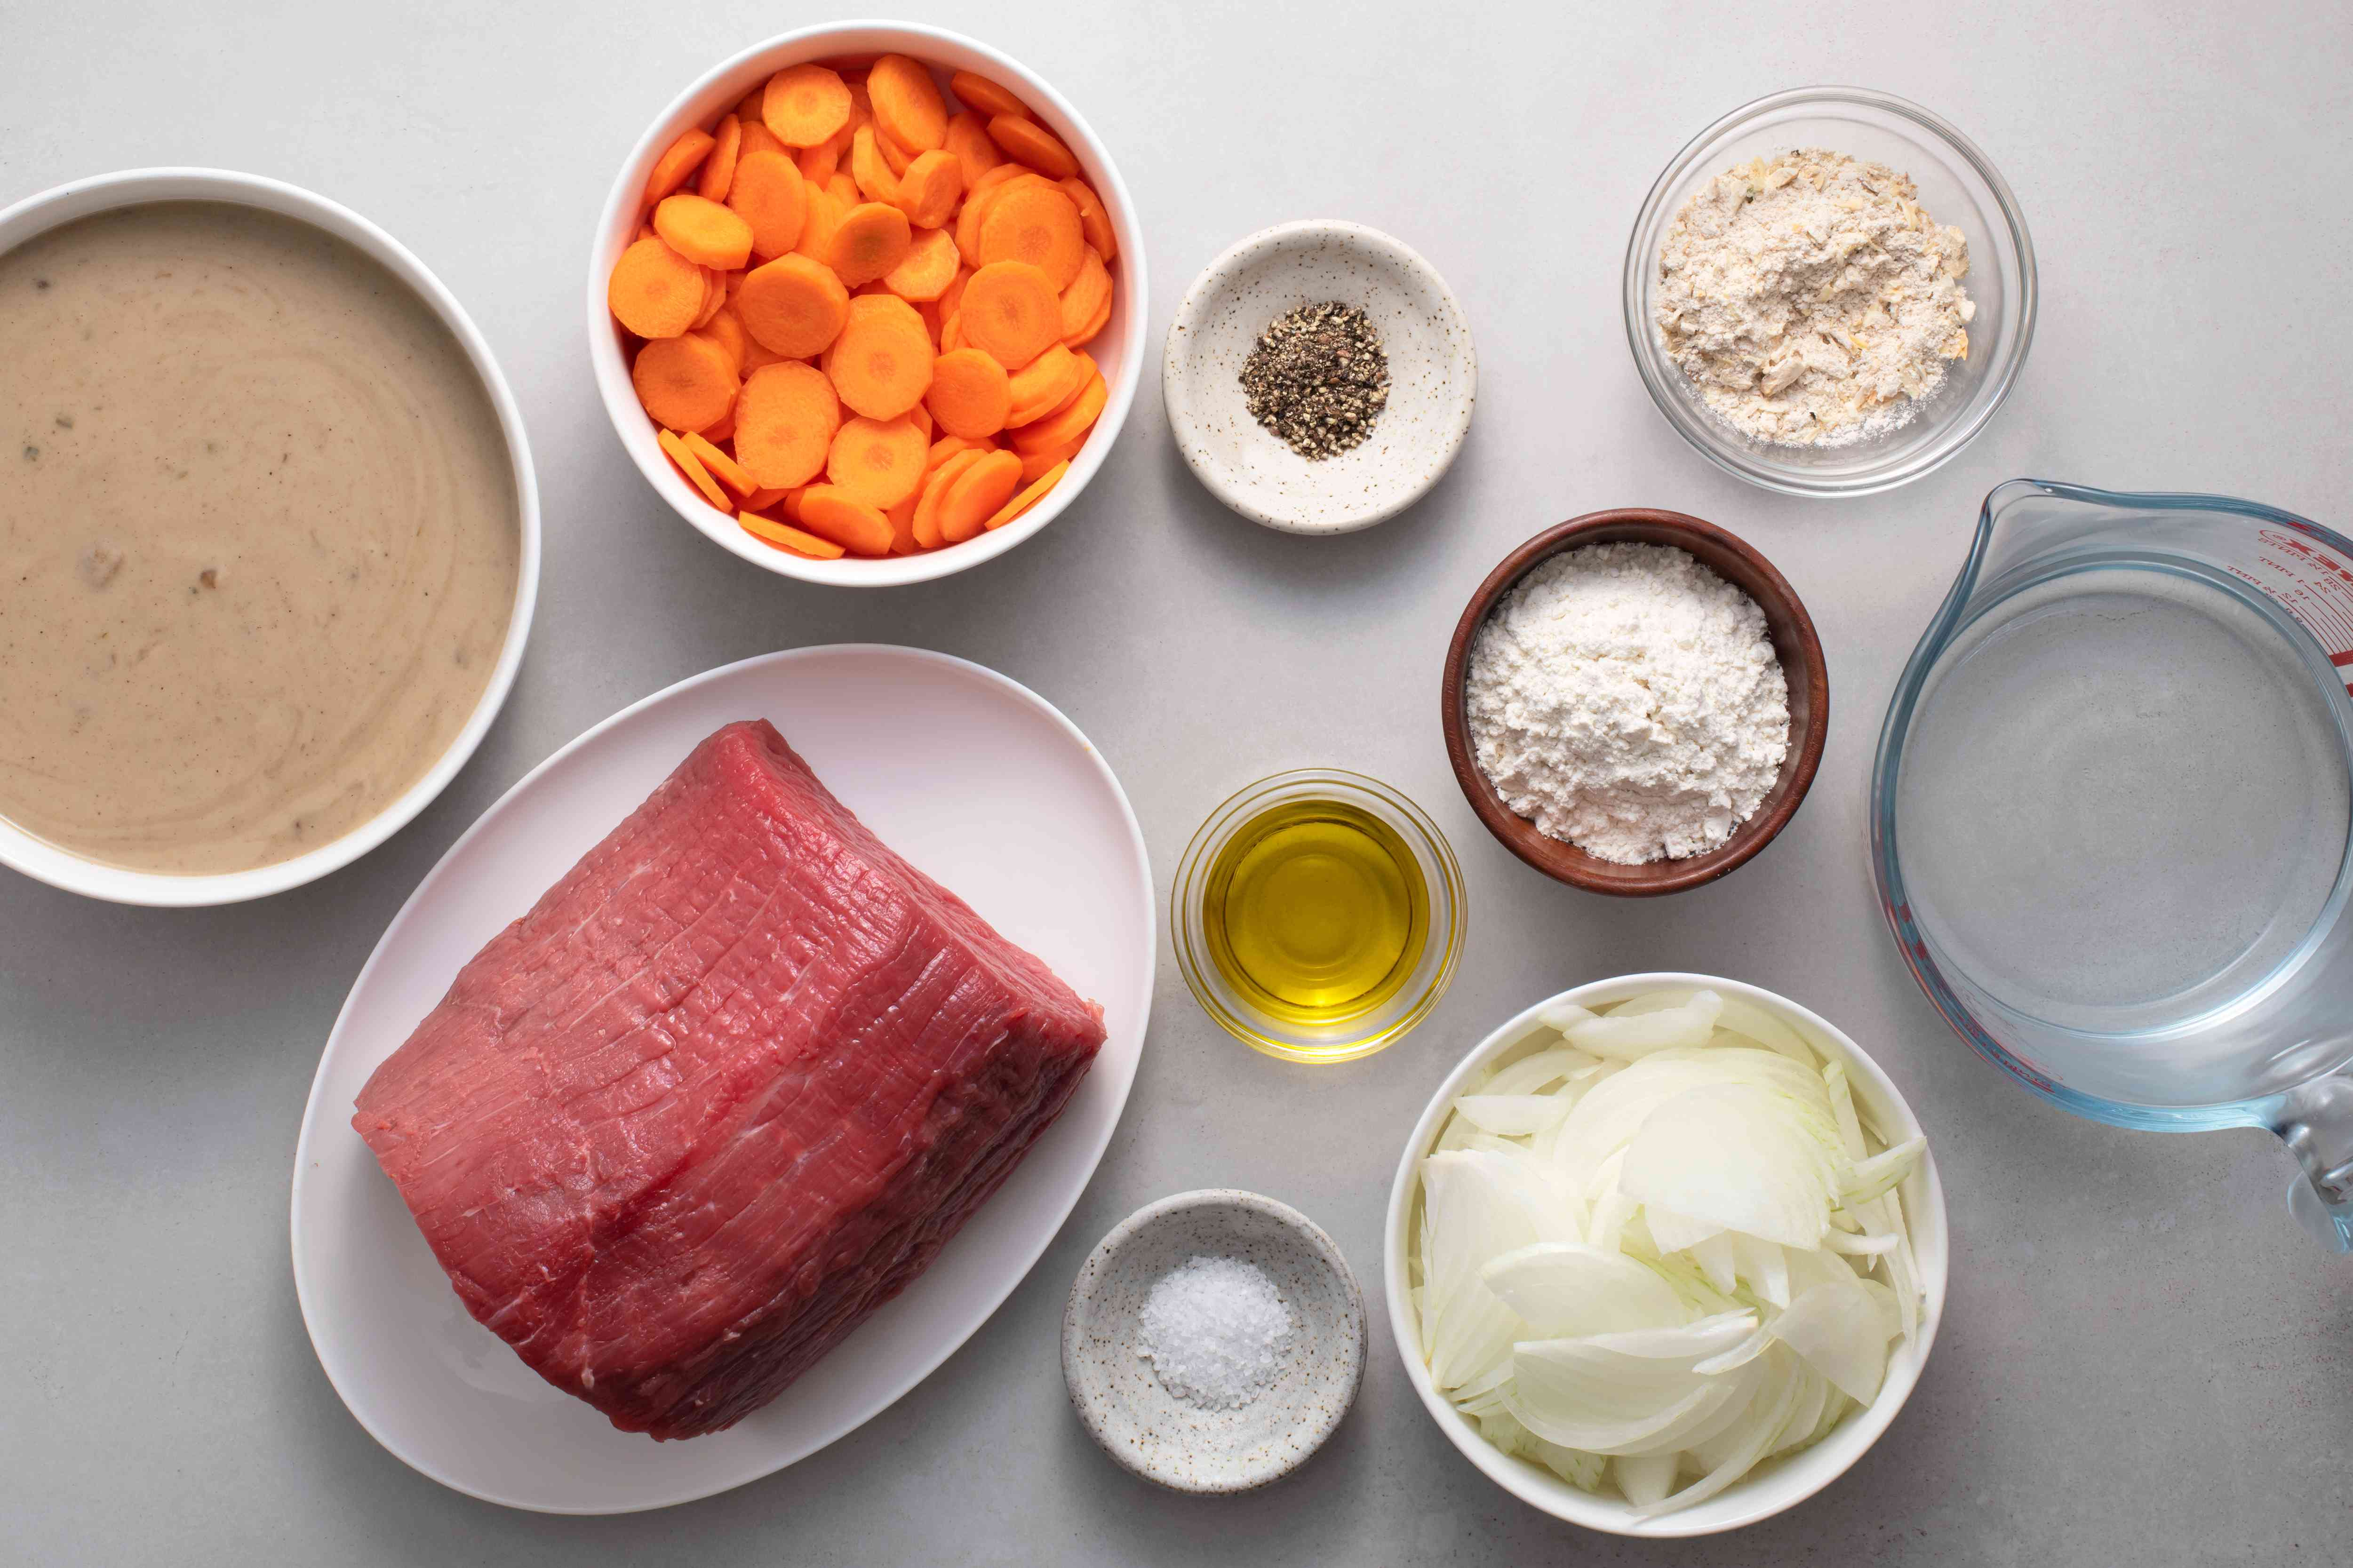 Gravy and Vegetables Slow Cooker Round Steak ingredients